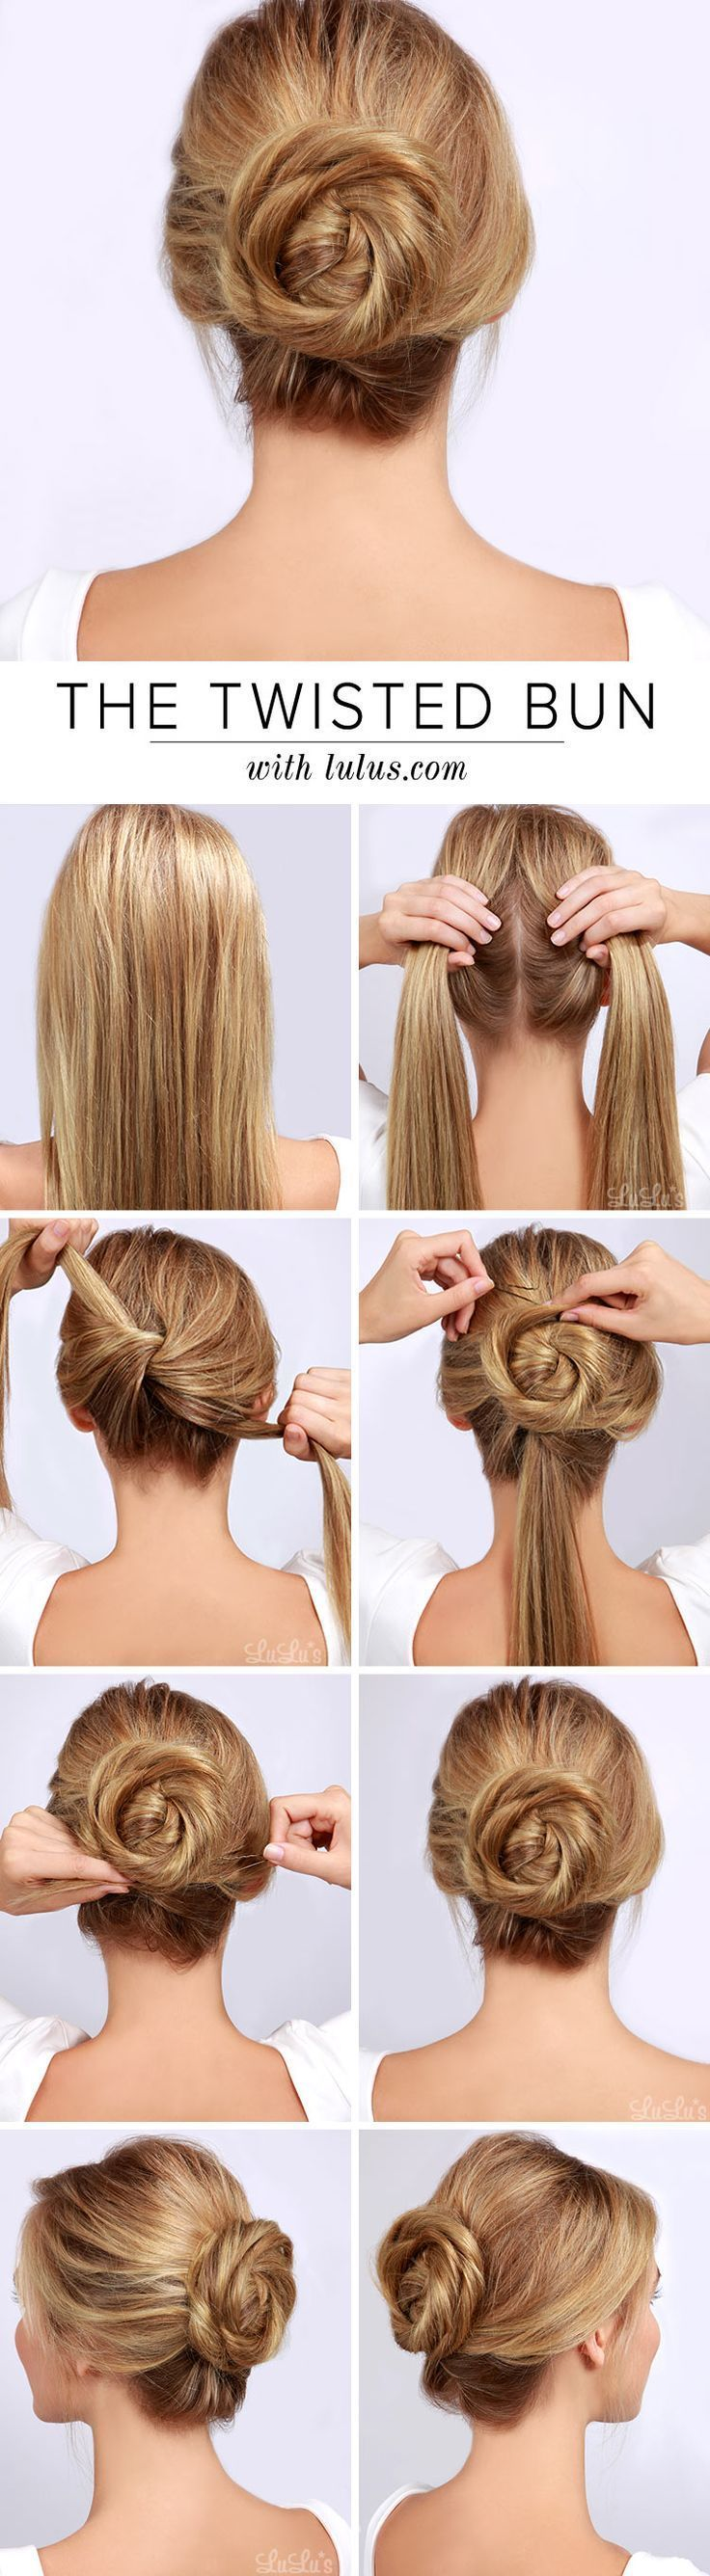 183 best ♤hair tutorials♤ images on pinterest | hairstyles, make